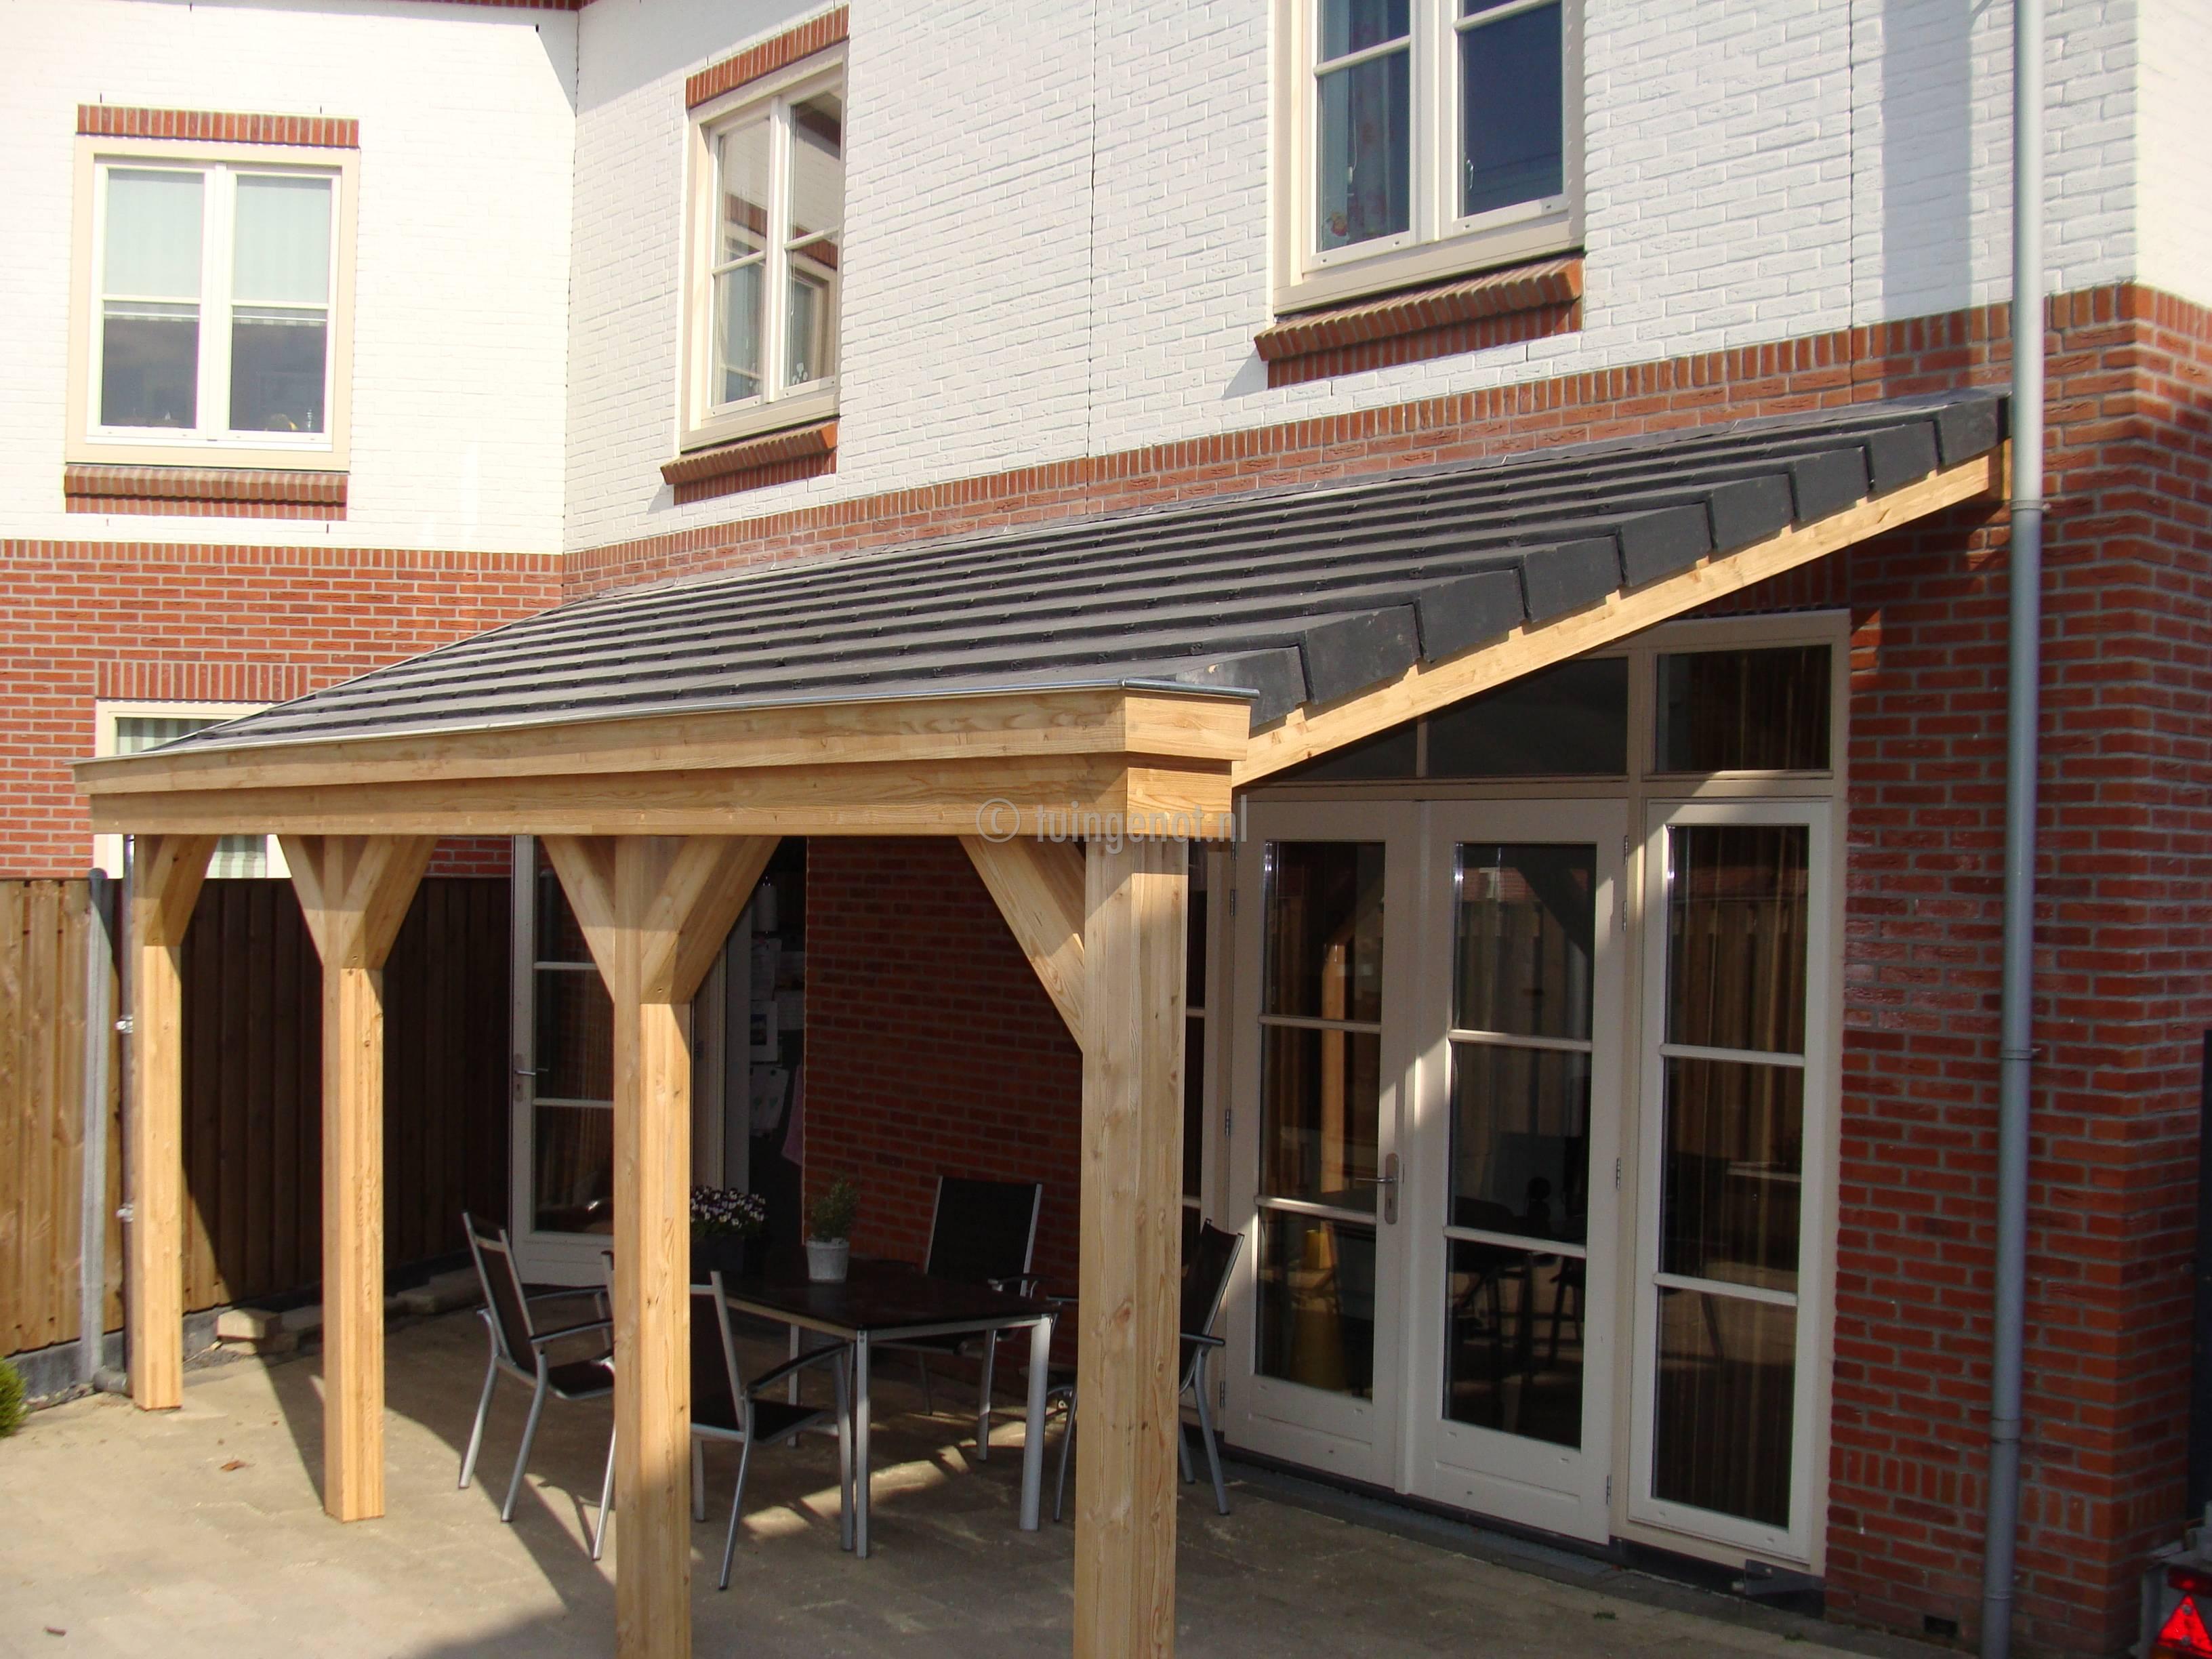 extreem tuingenot lariks houten veranda overkapping met epdm daksingels ya93